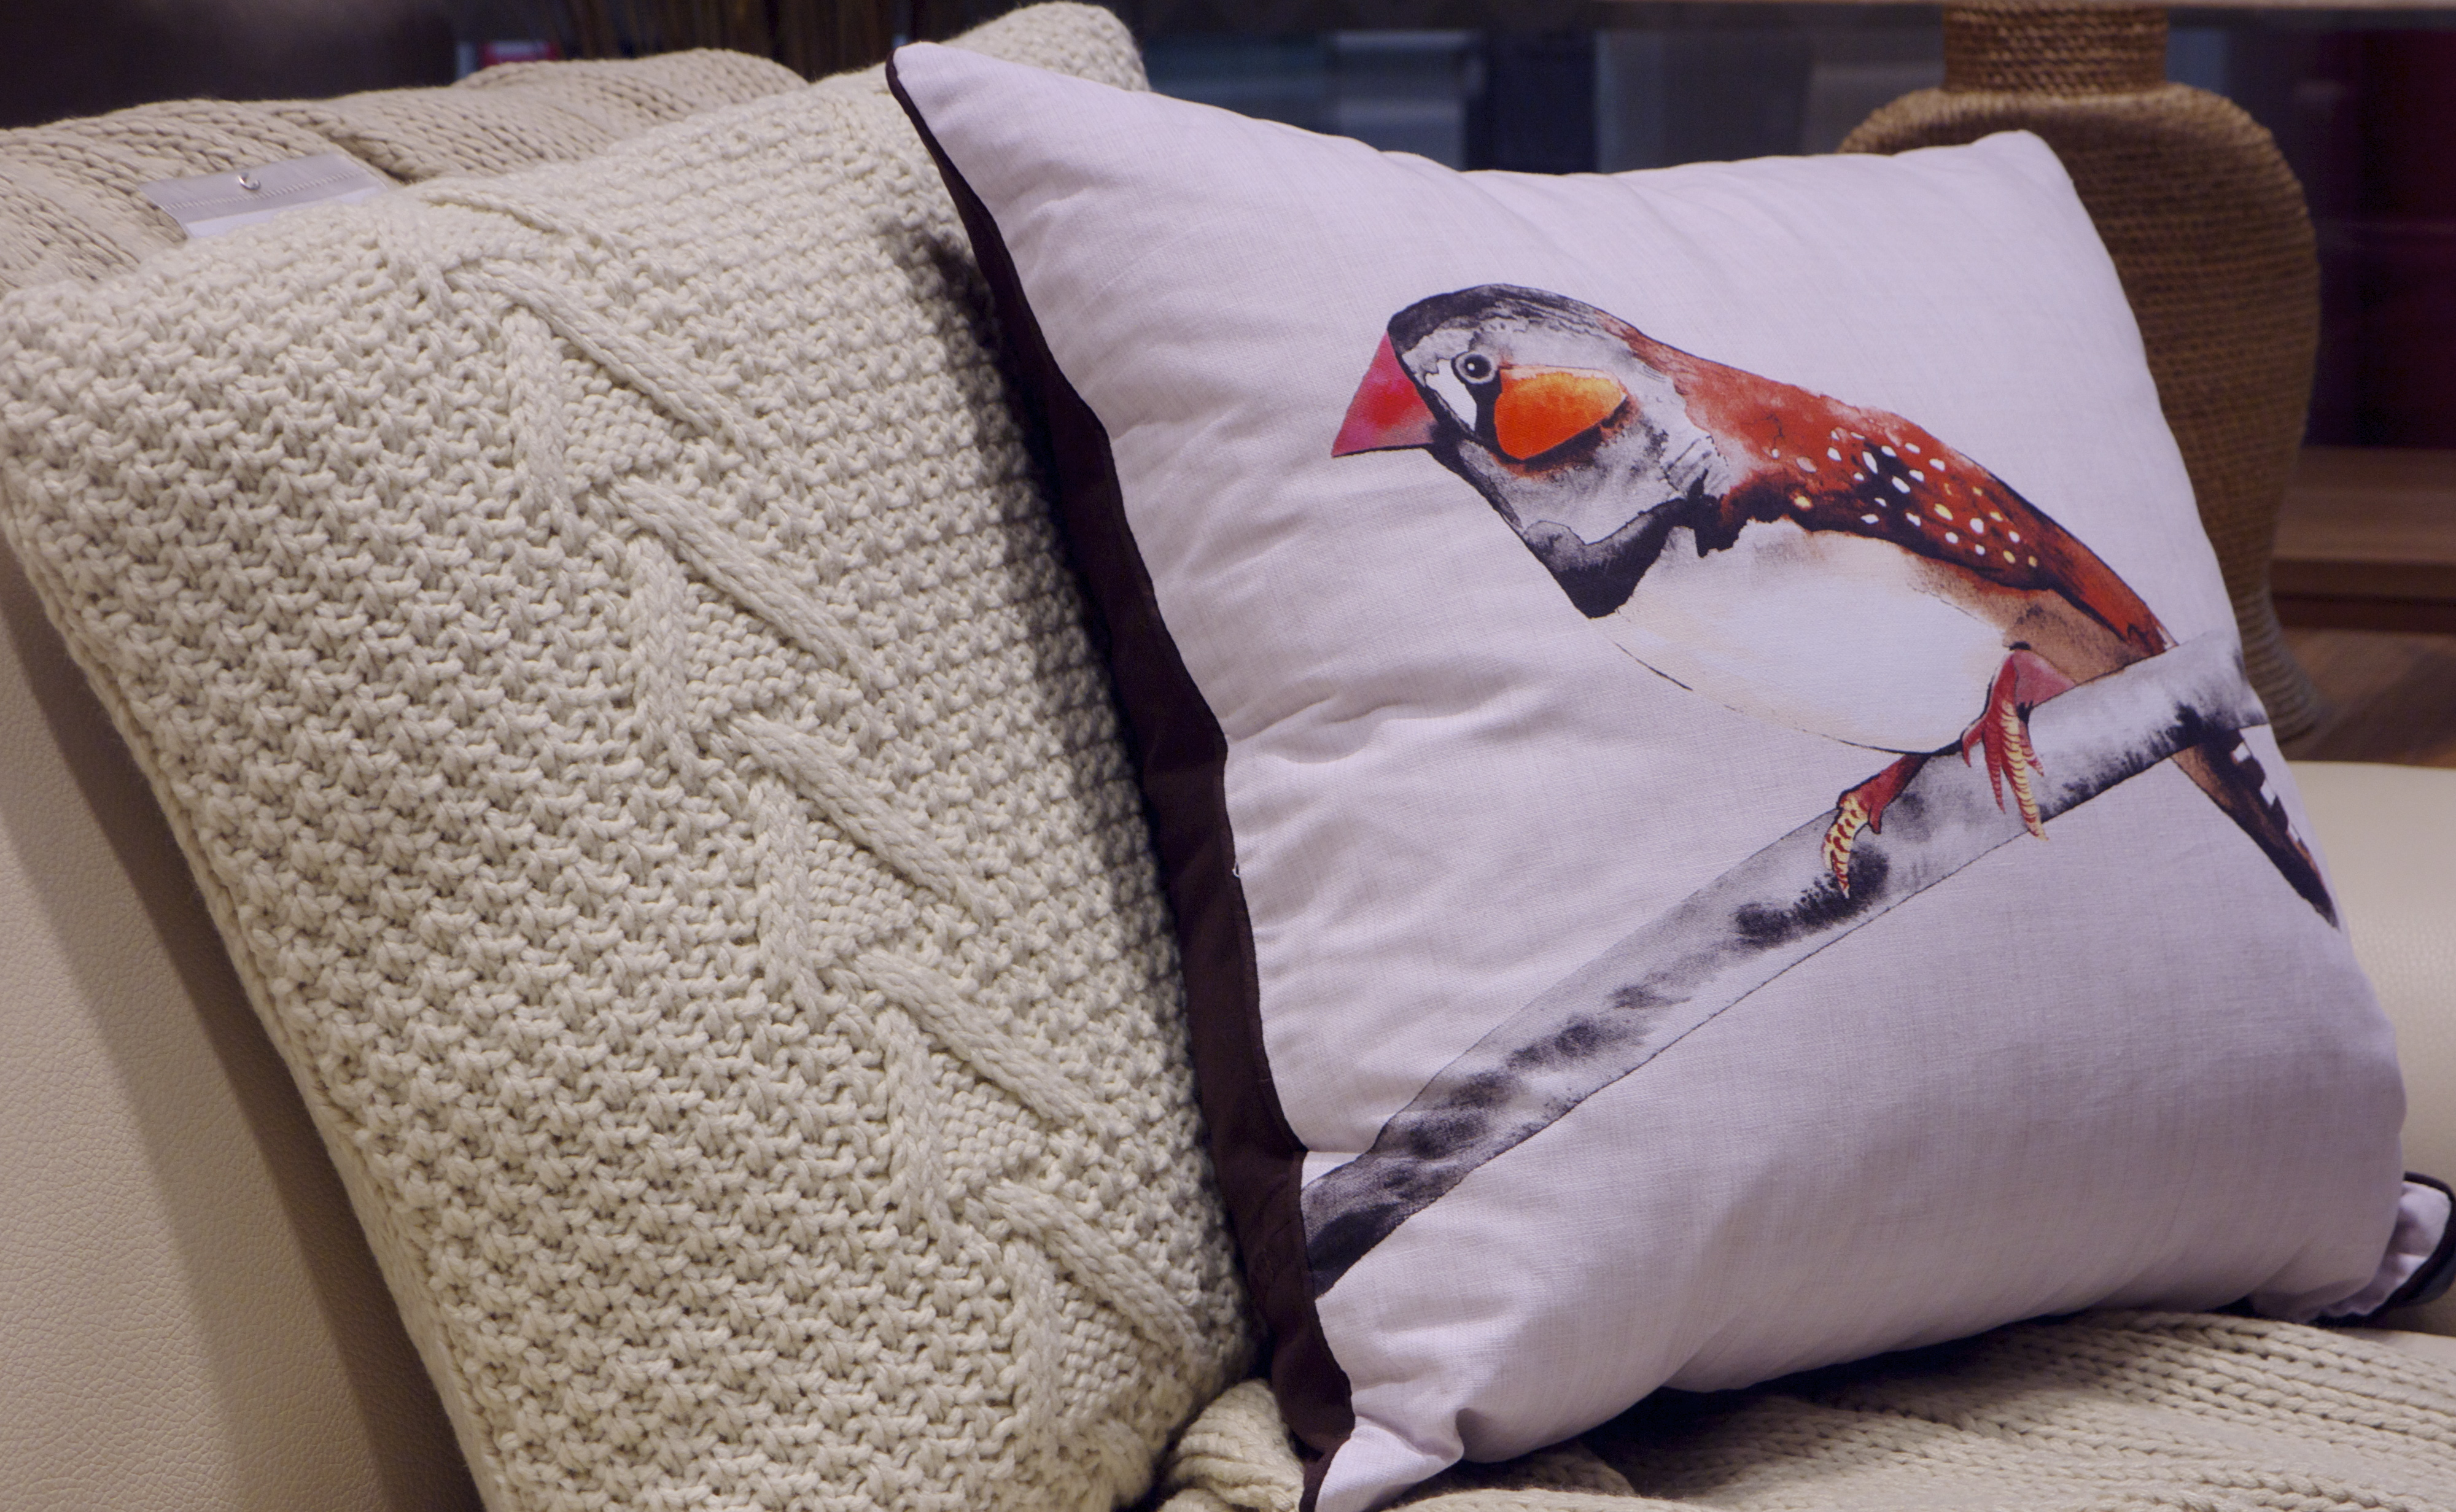 Wren Bird Cushion from Freedom Top Ryde